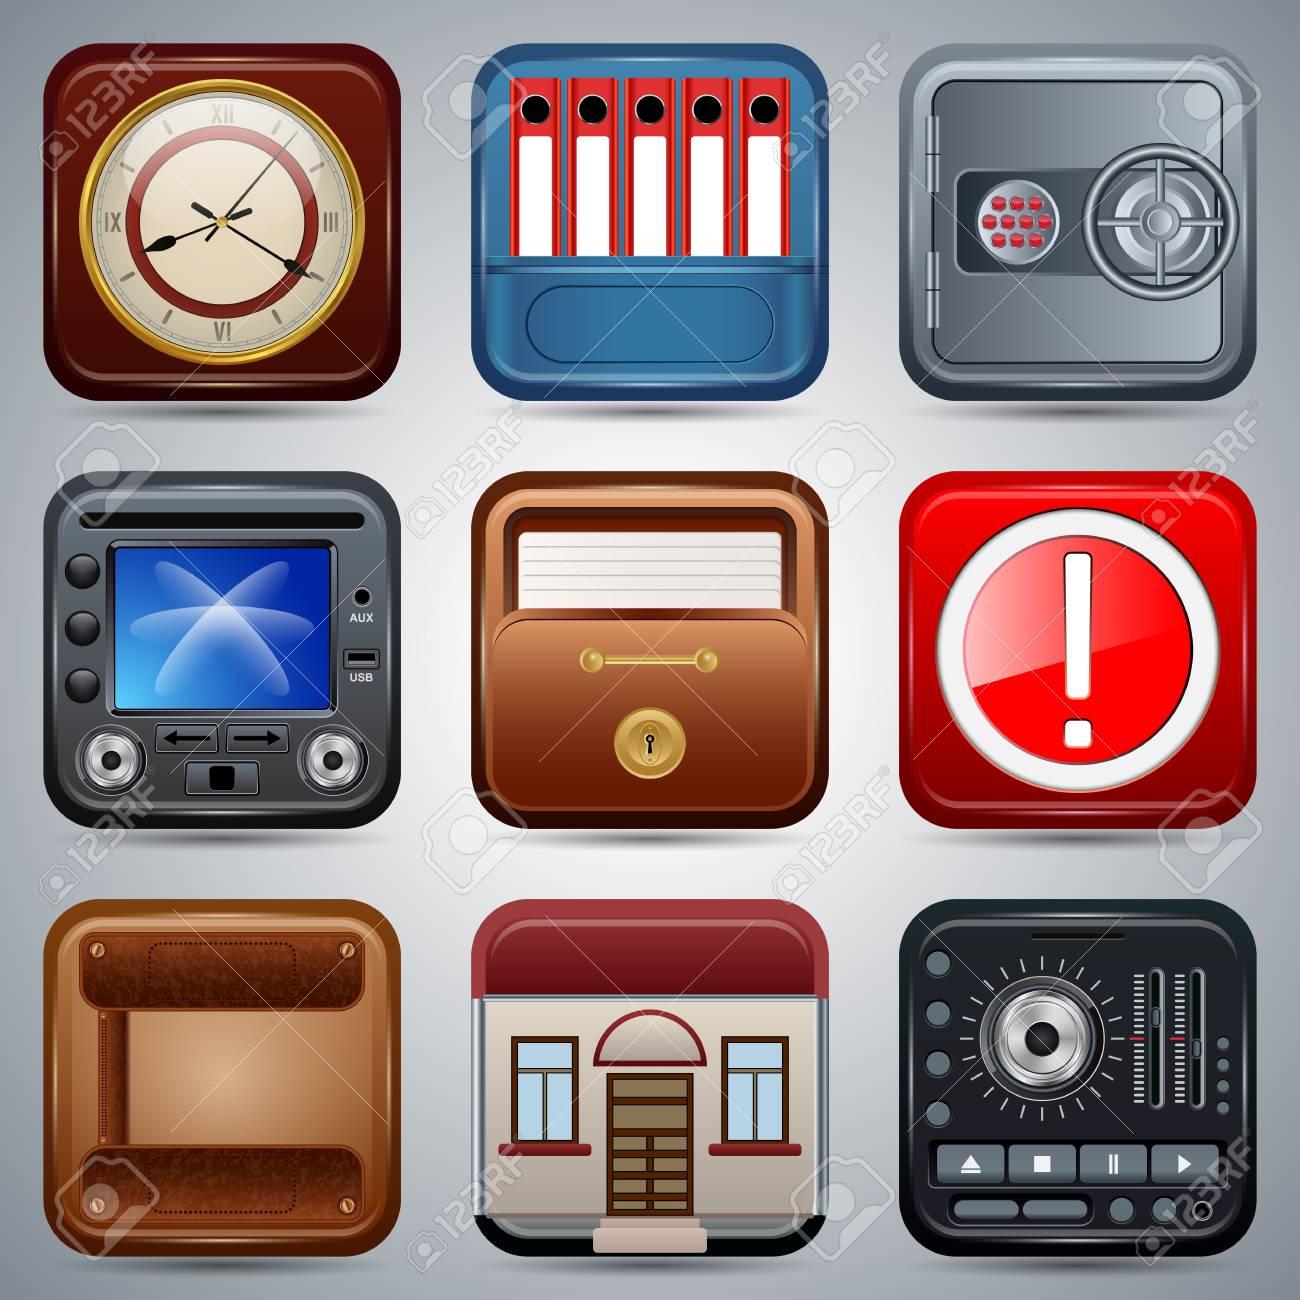 Application icons vector set Stock Vector - 20664247